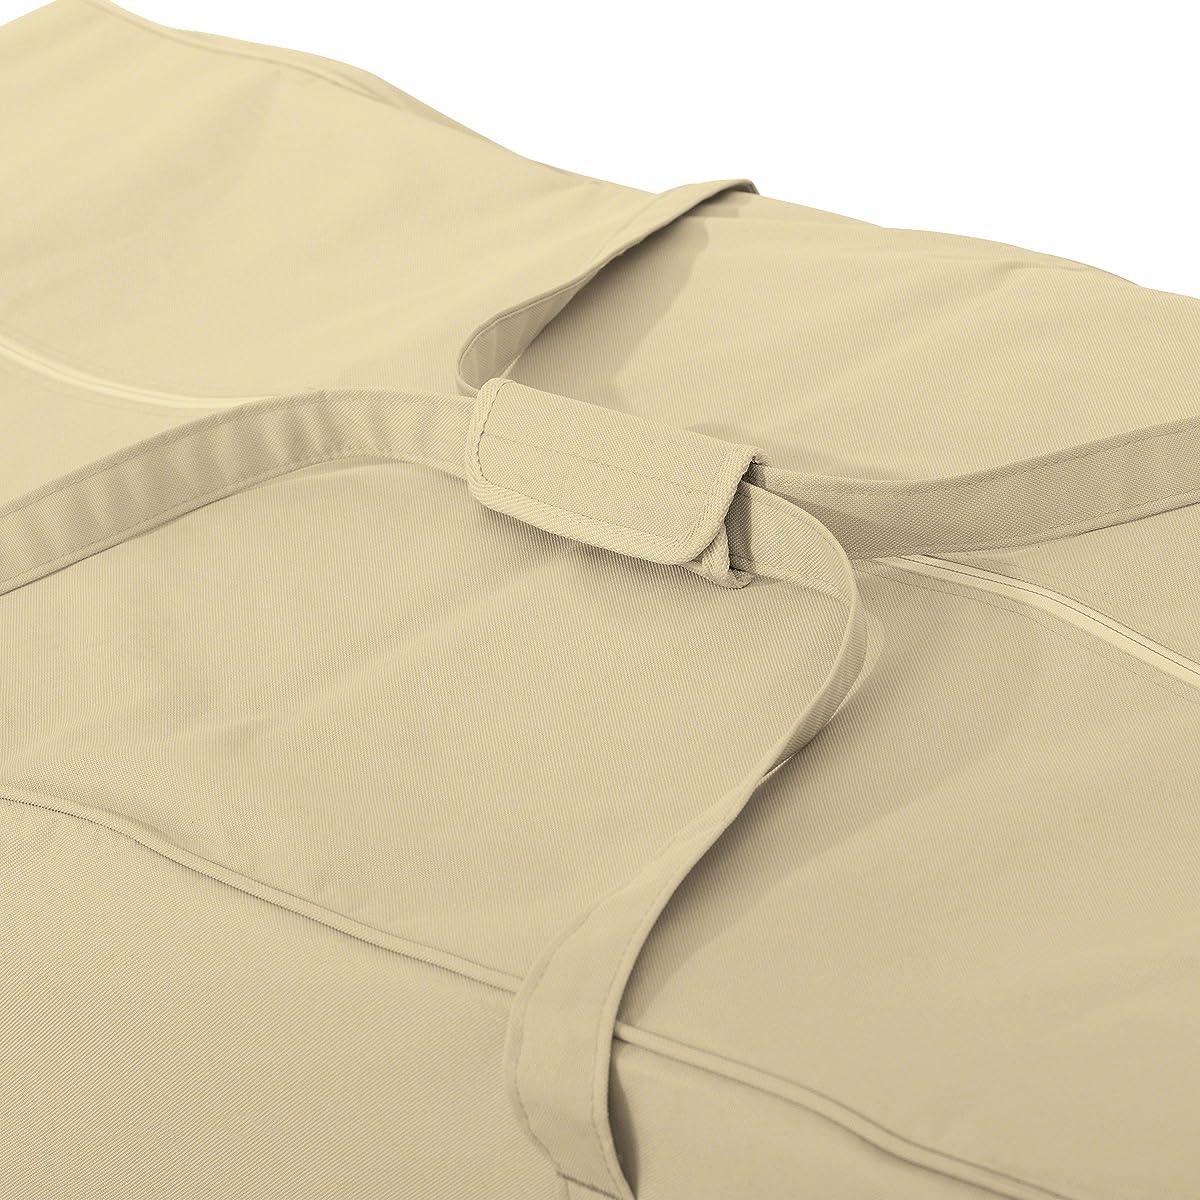 Classic Accessories 55-648-051501-00 Veranda Patio Cushion & Cover Storage Bag, Oversized